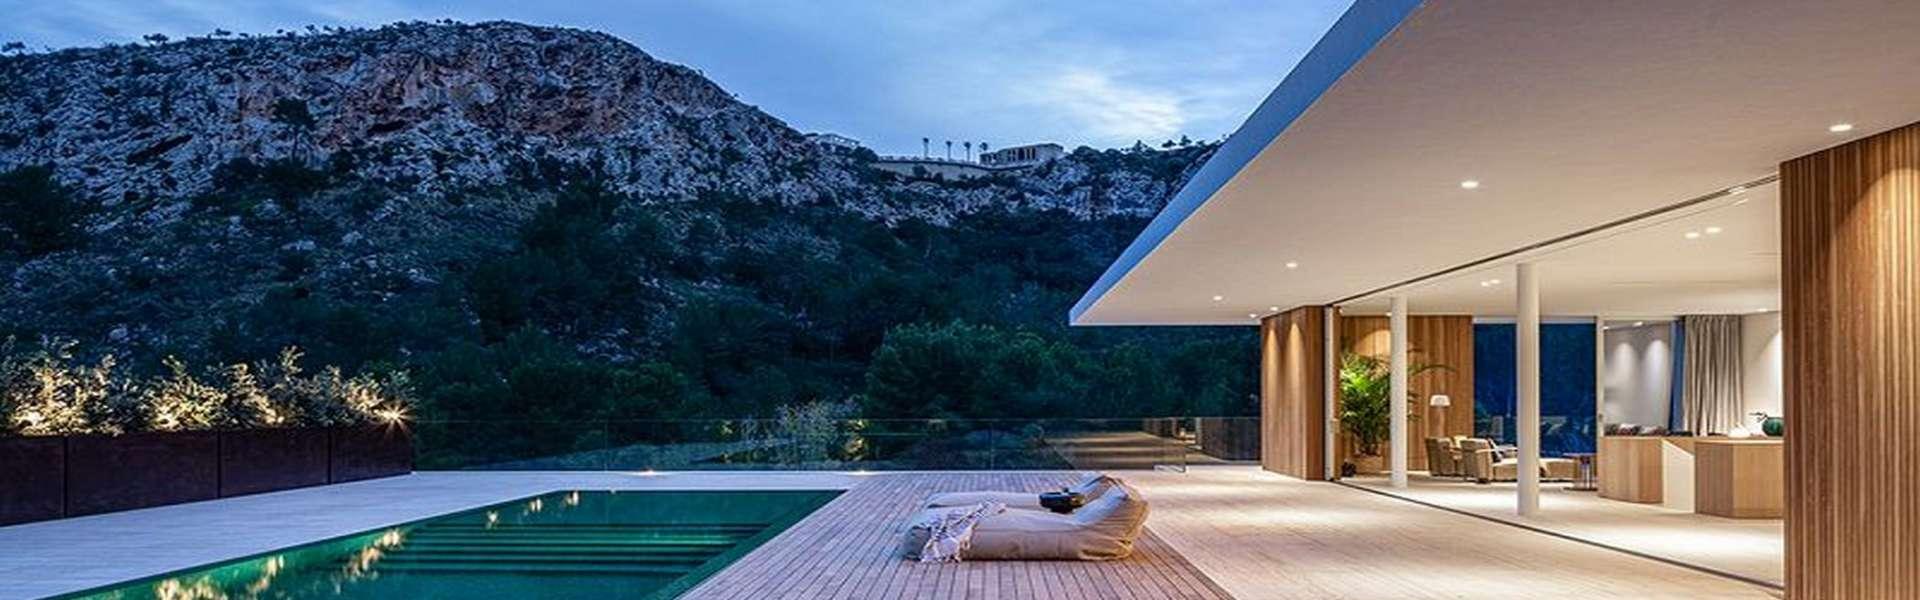 Palma/Son Vida - Villa de lujo con vistas impresionantes